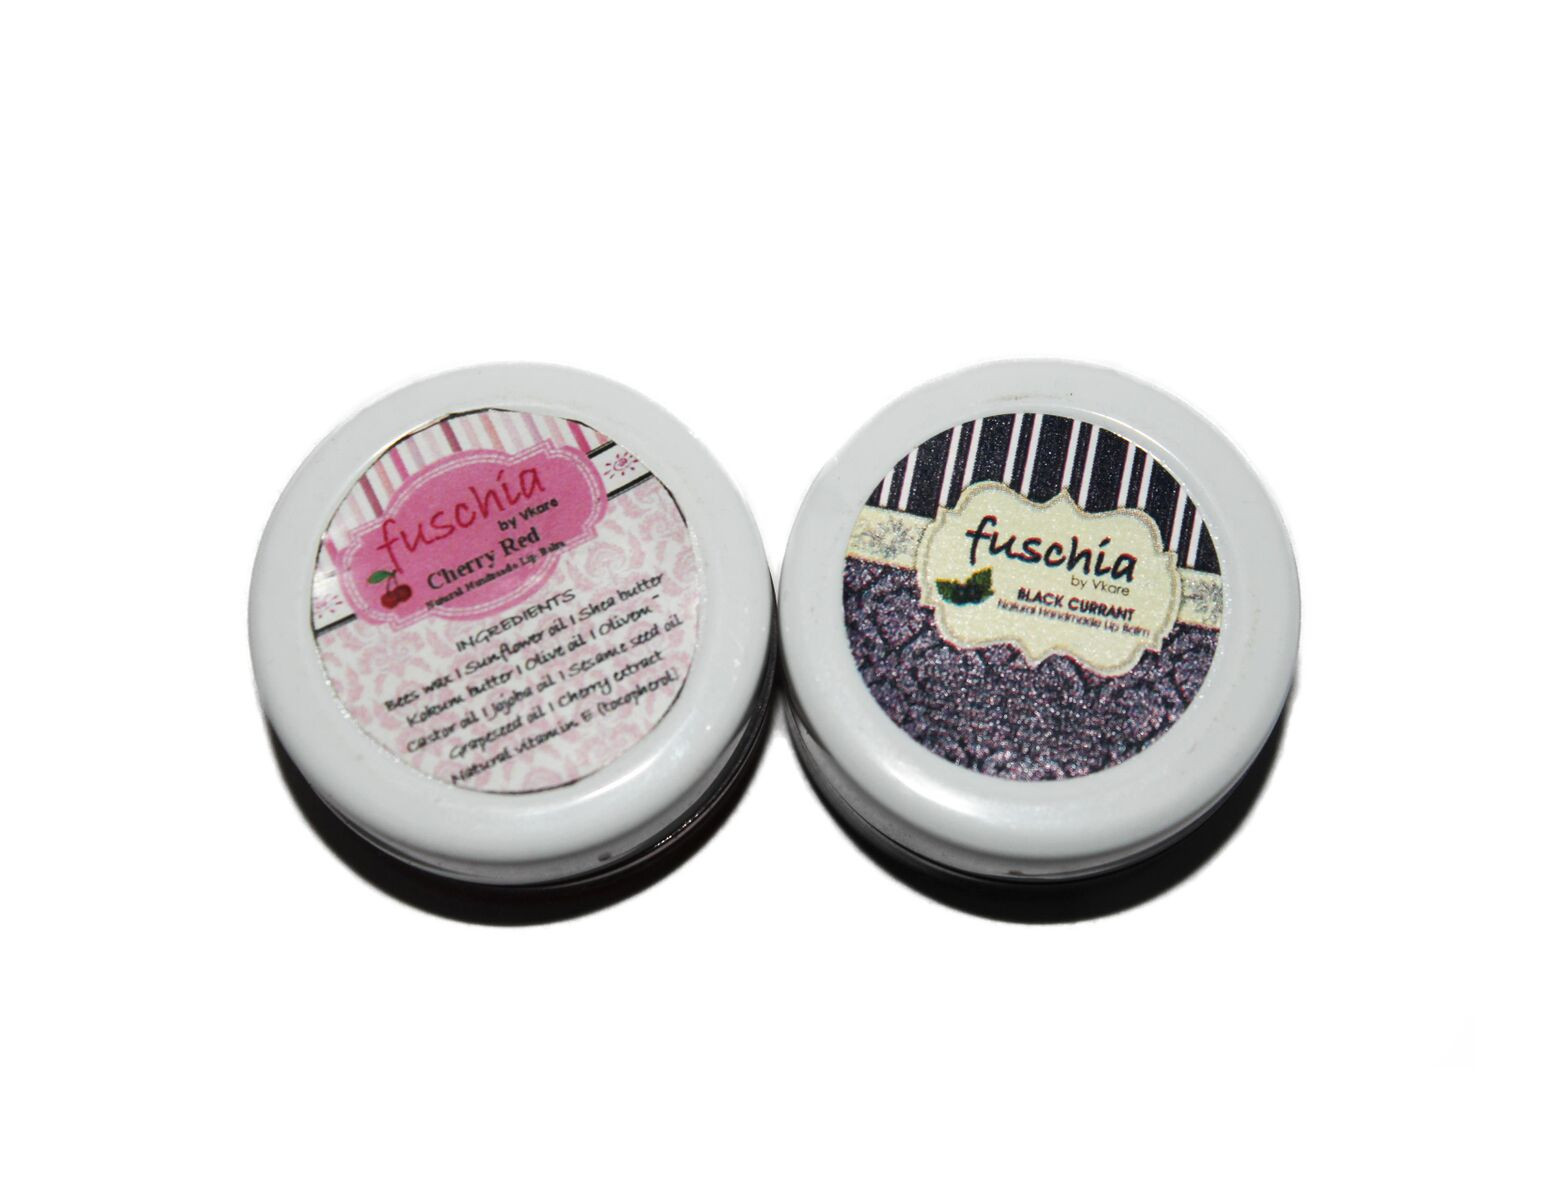 Fuschia – Cherry Red & Black Currant Lip Balm Combo 16gm